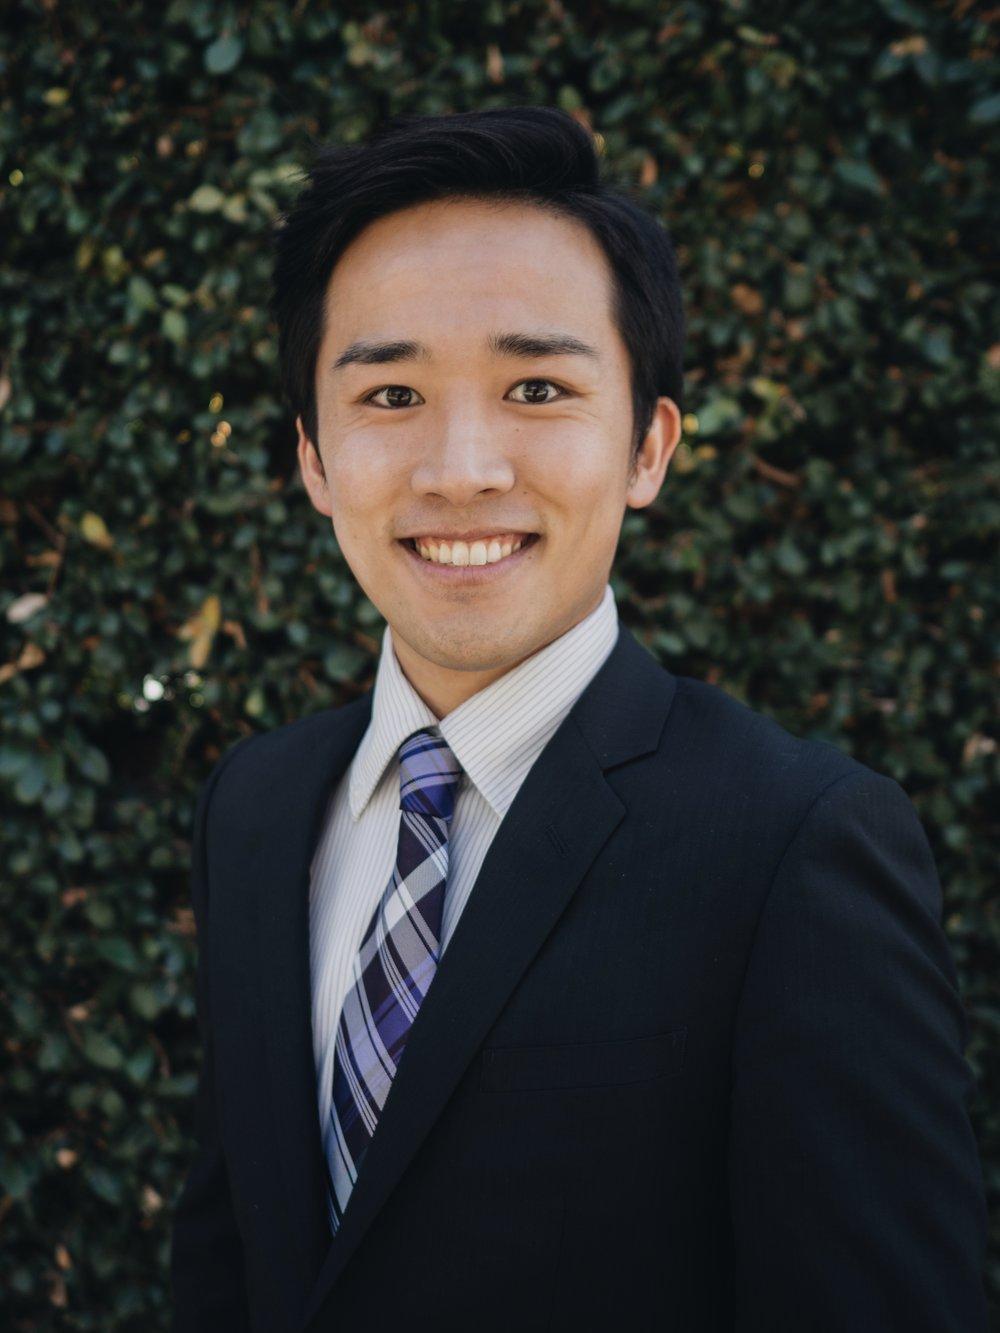 Shoun Matsuka,Bioengineering Lead - Mechanical